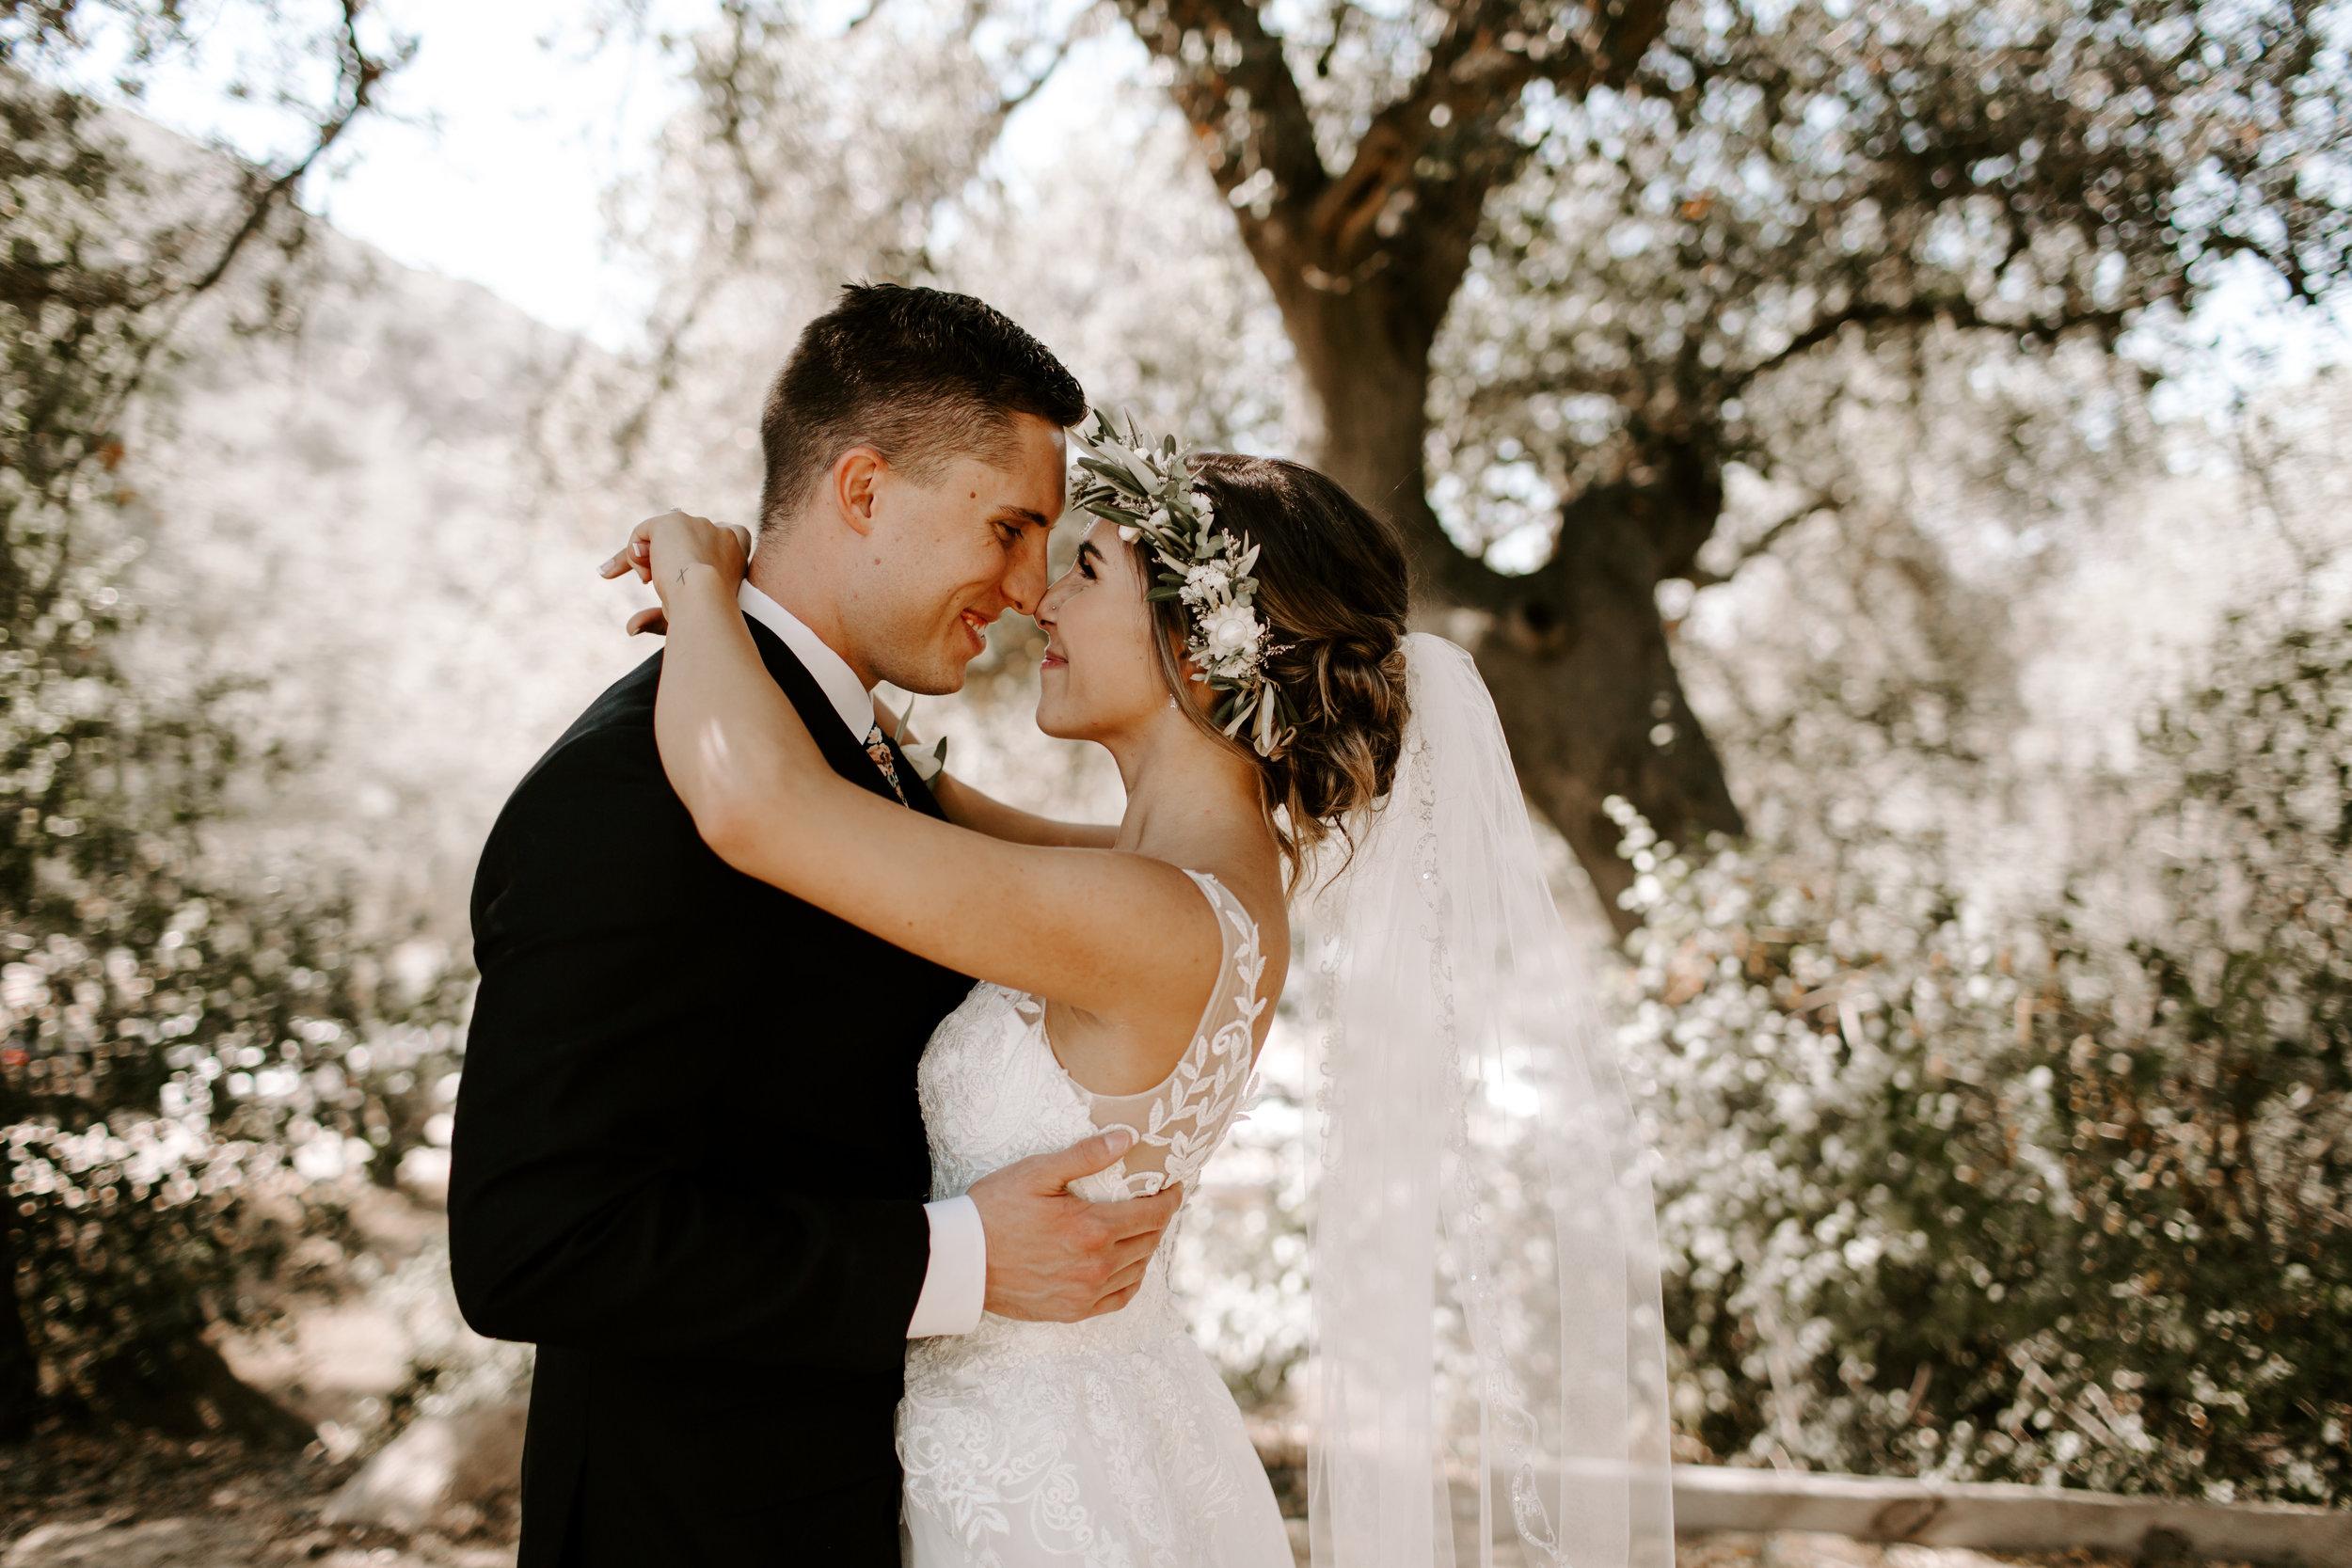 kate+zack_wedding_secludedgardenestate_temecula_madisonrylee_0606.jpg